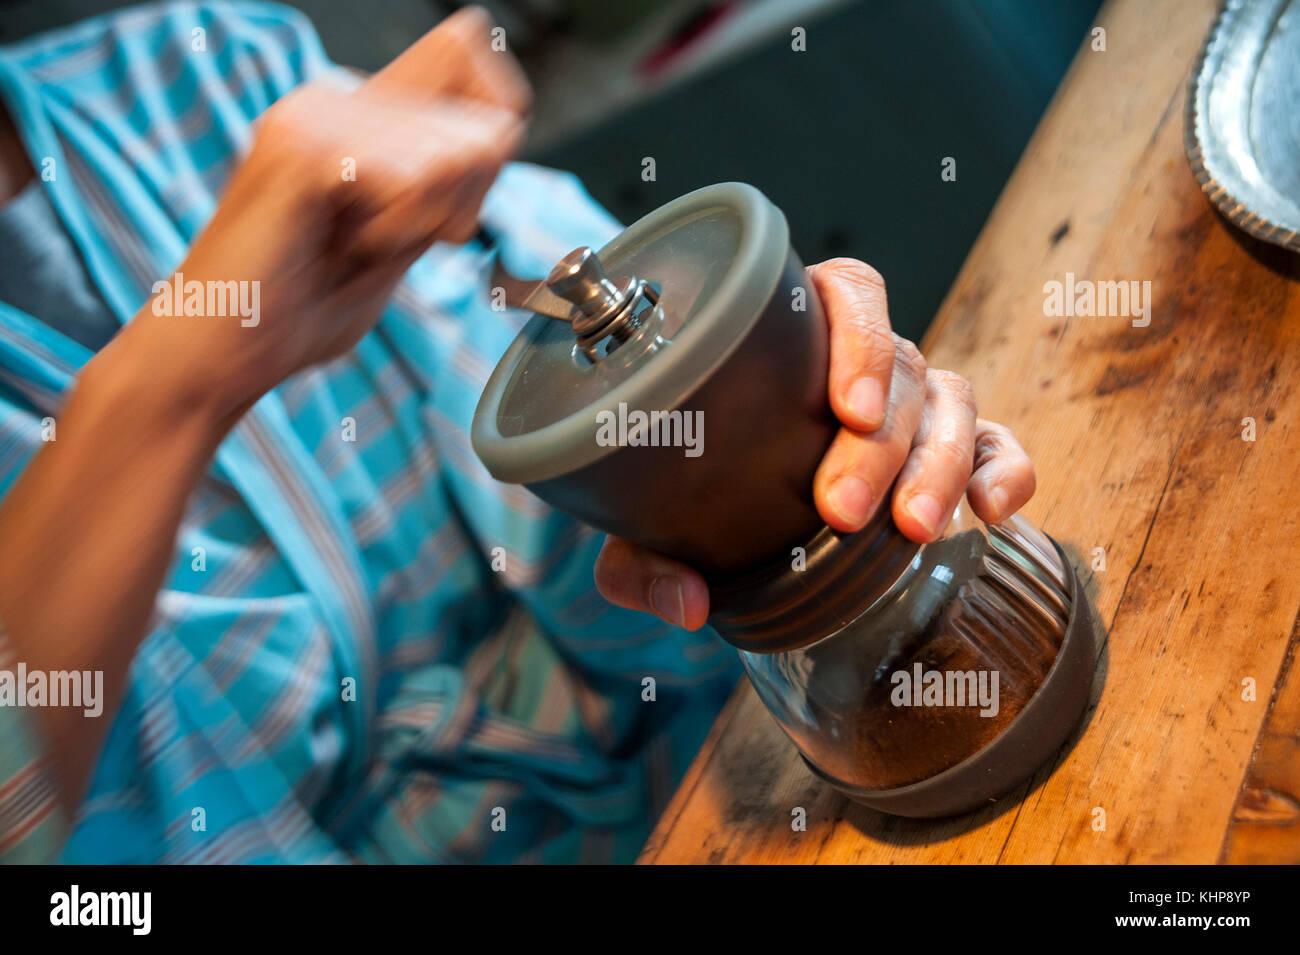 HARIO Hand Coffee Mill - Stock Image